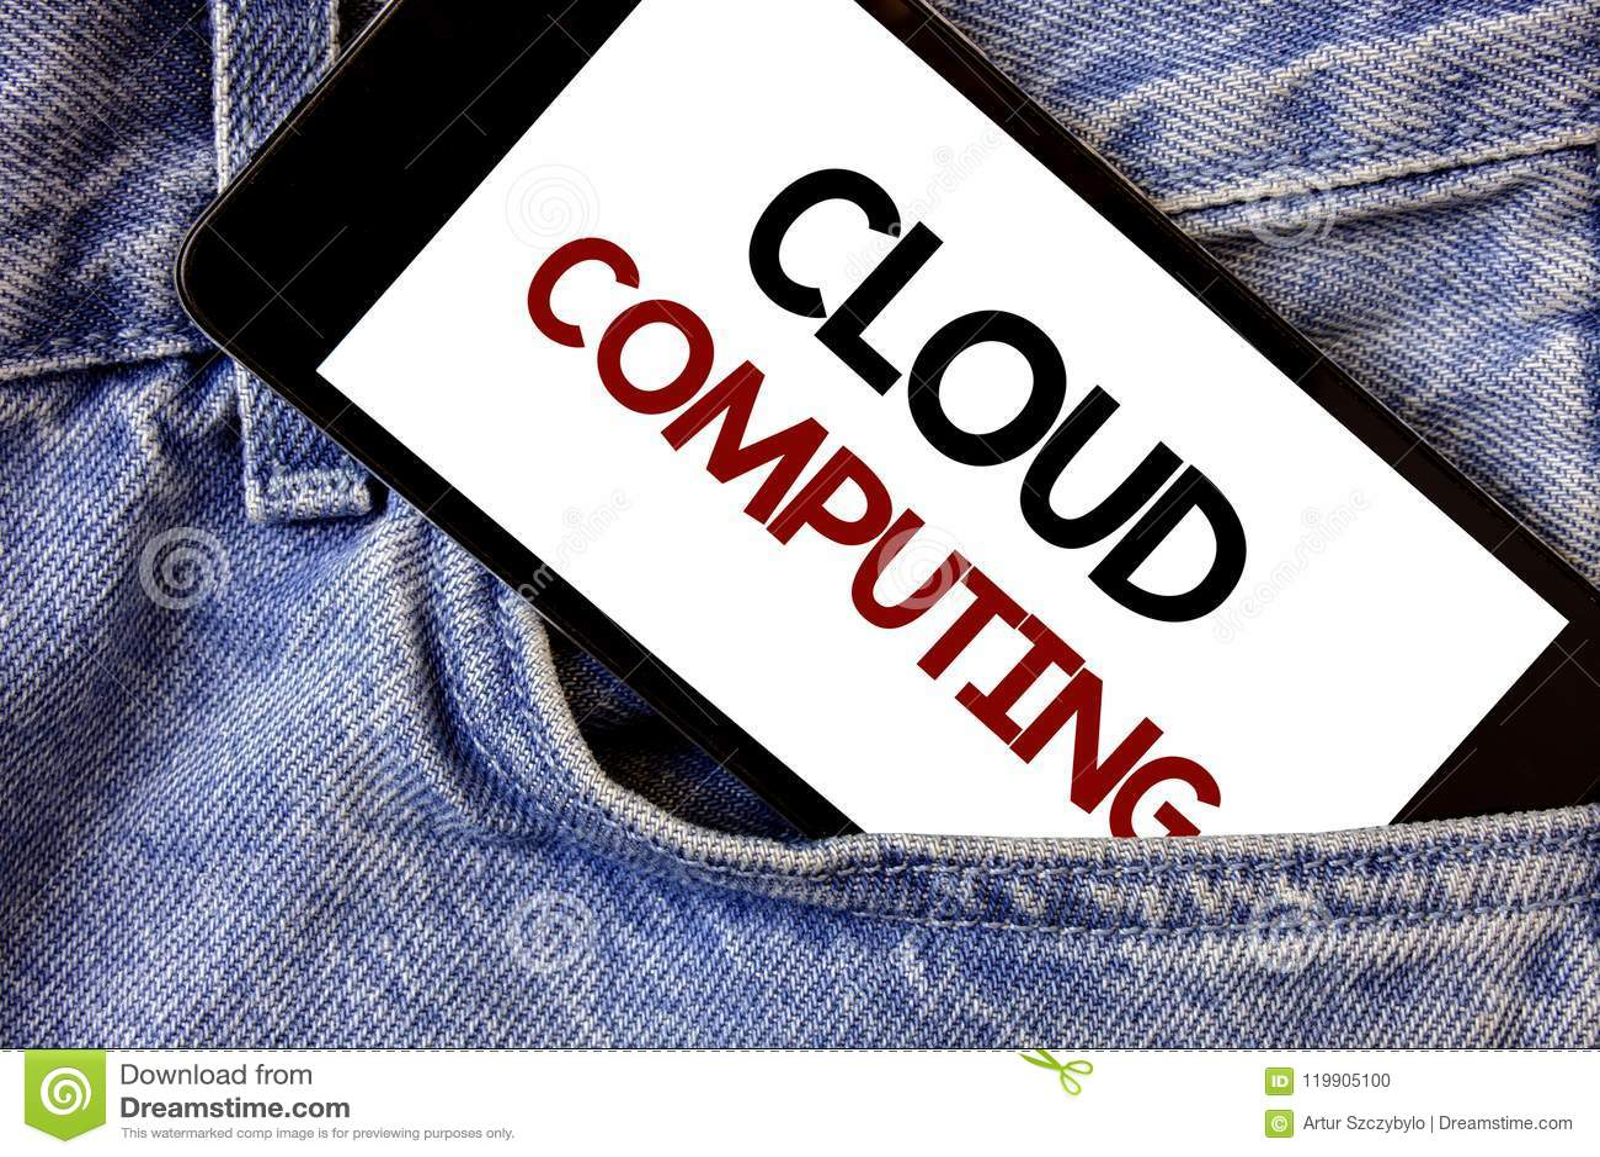 Business Concept For Online Information Storage Virtual Media Data Server